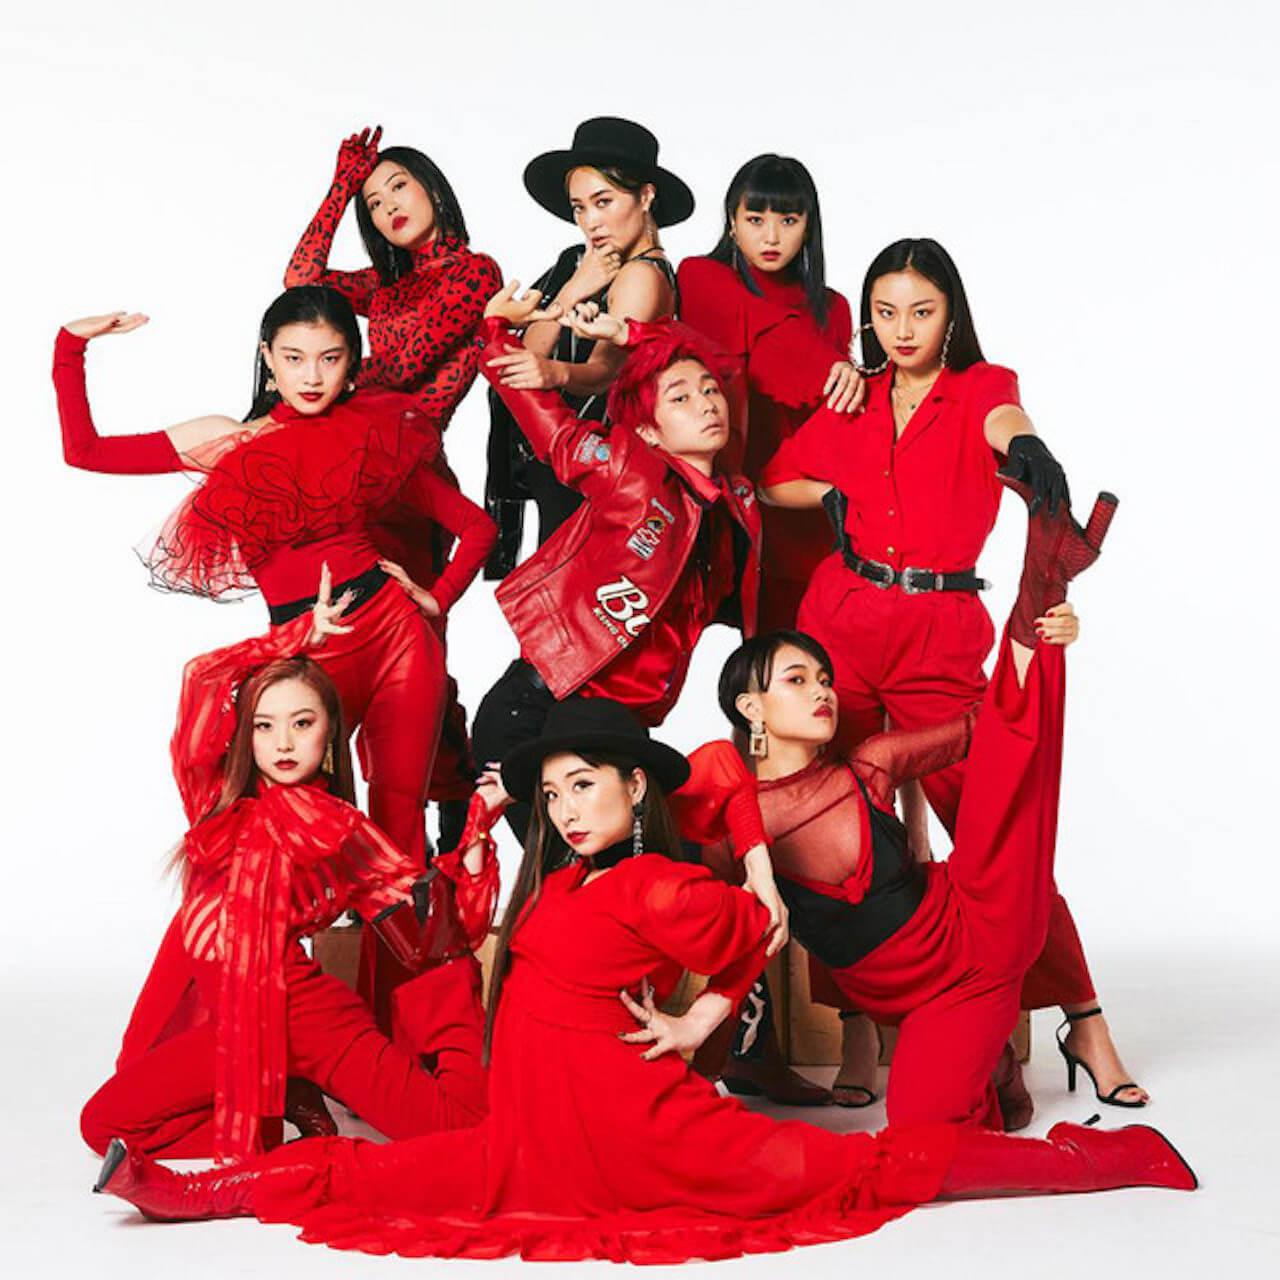 MFSがダンスチームMONOLIZとのコラボ楽曲「Better Now」MVを公開|監督はITARU SAWADA music210616-mfs-monoliz-4